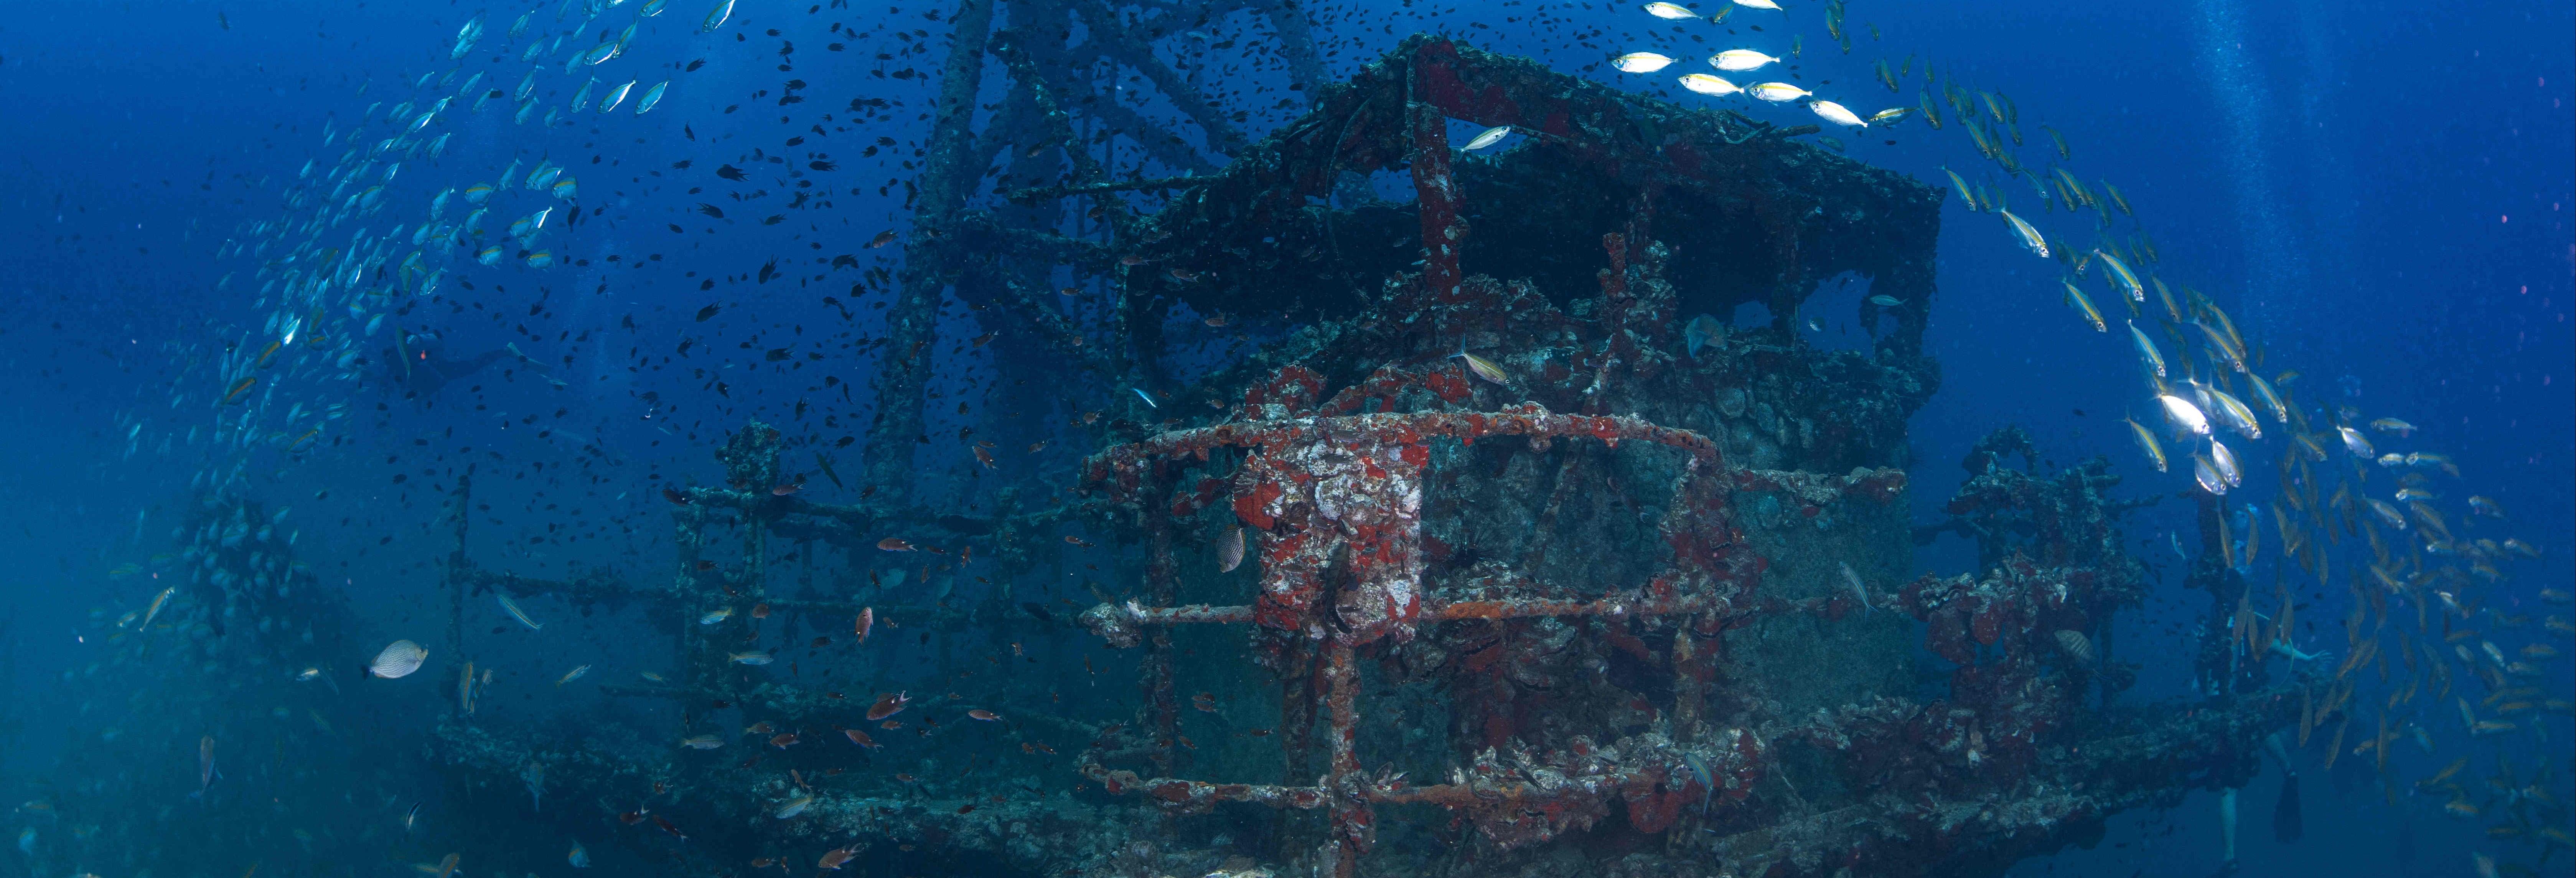 HTMS Chang Shipwreck Scuba Dive